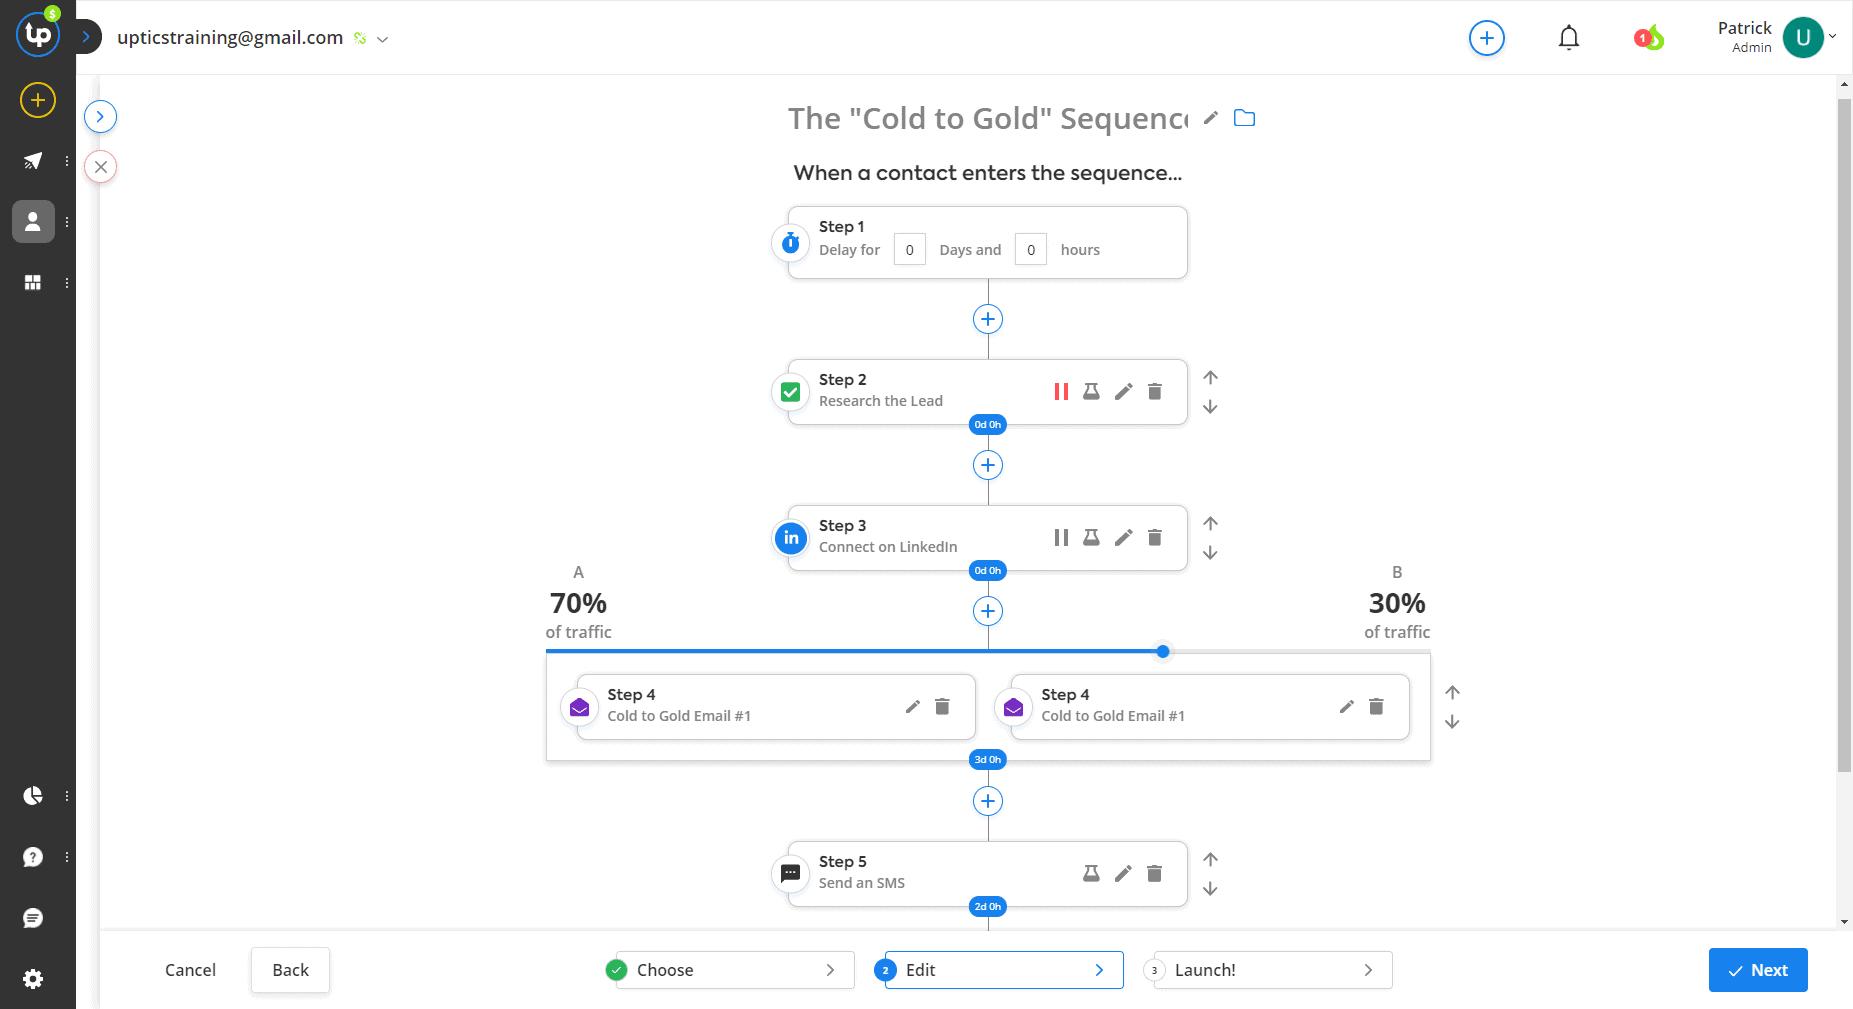 Uptics | All-in-one Sales Automation Platform 2